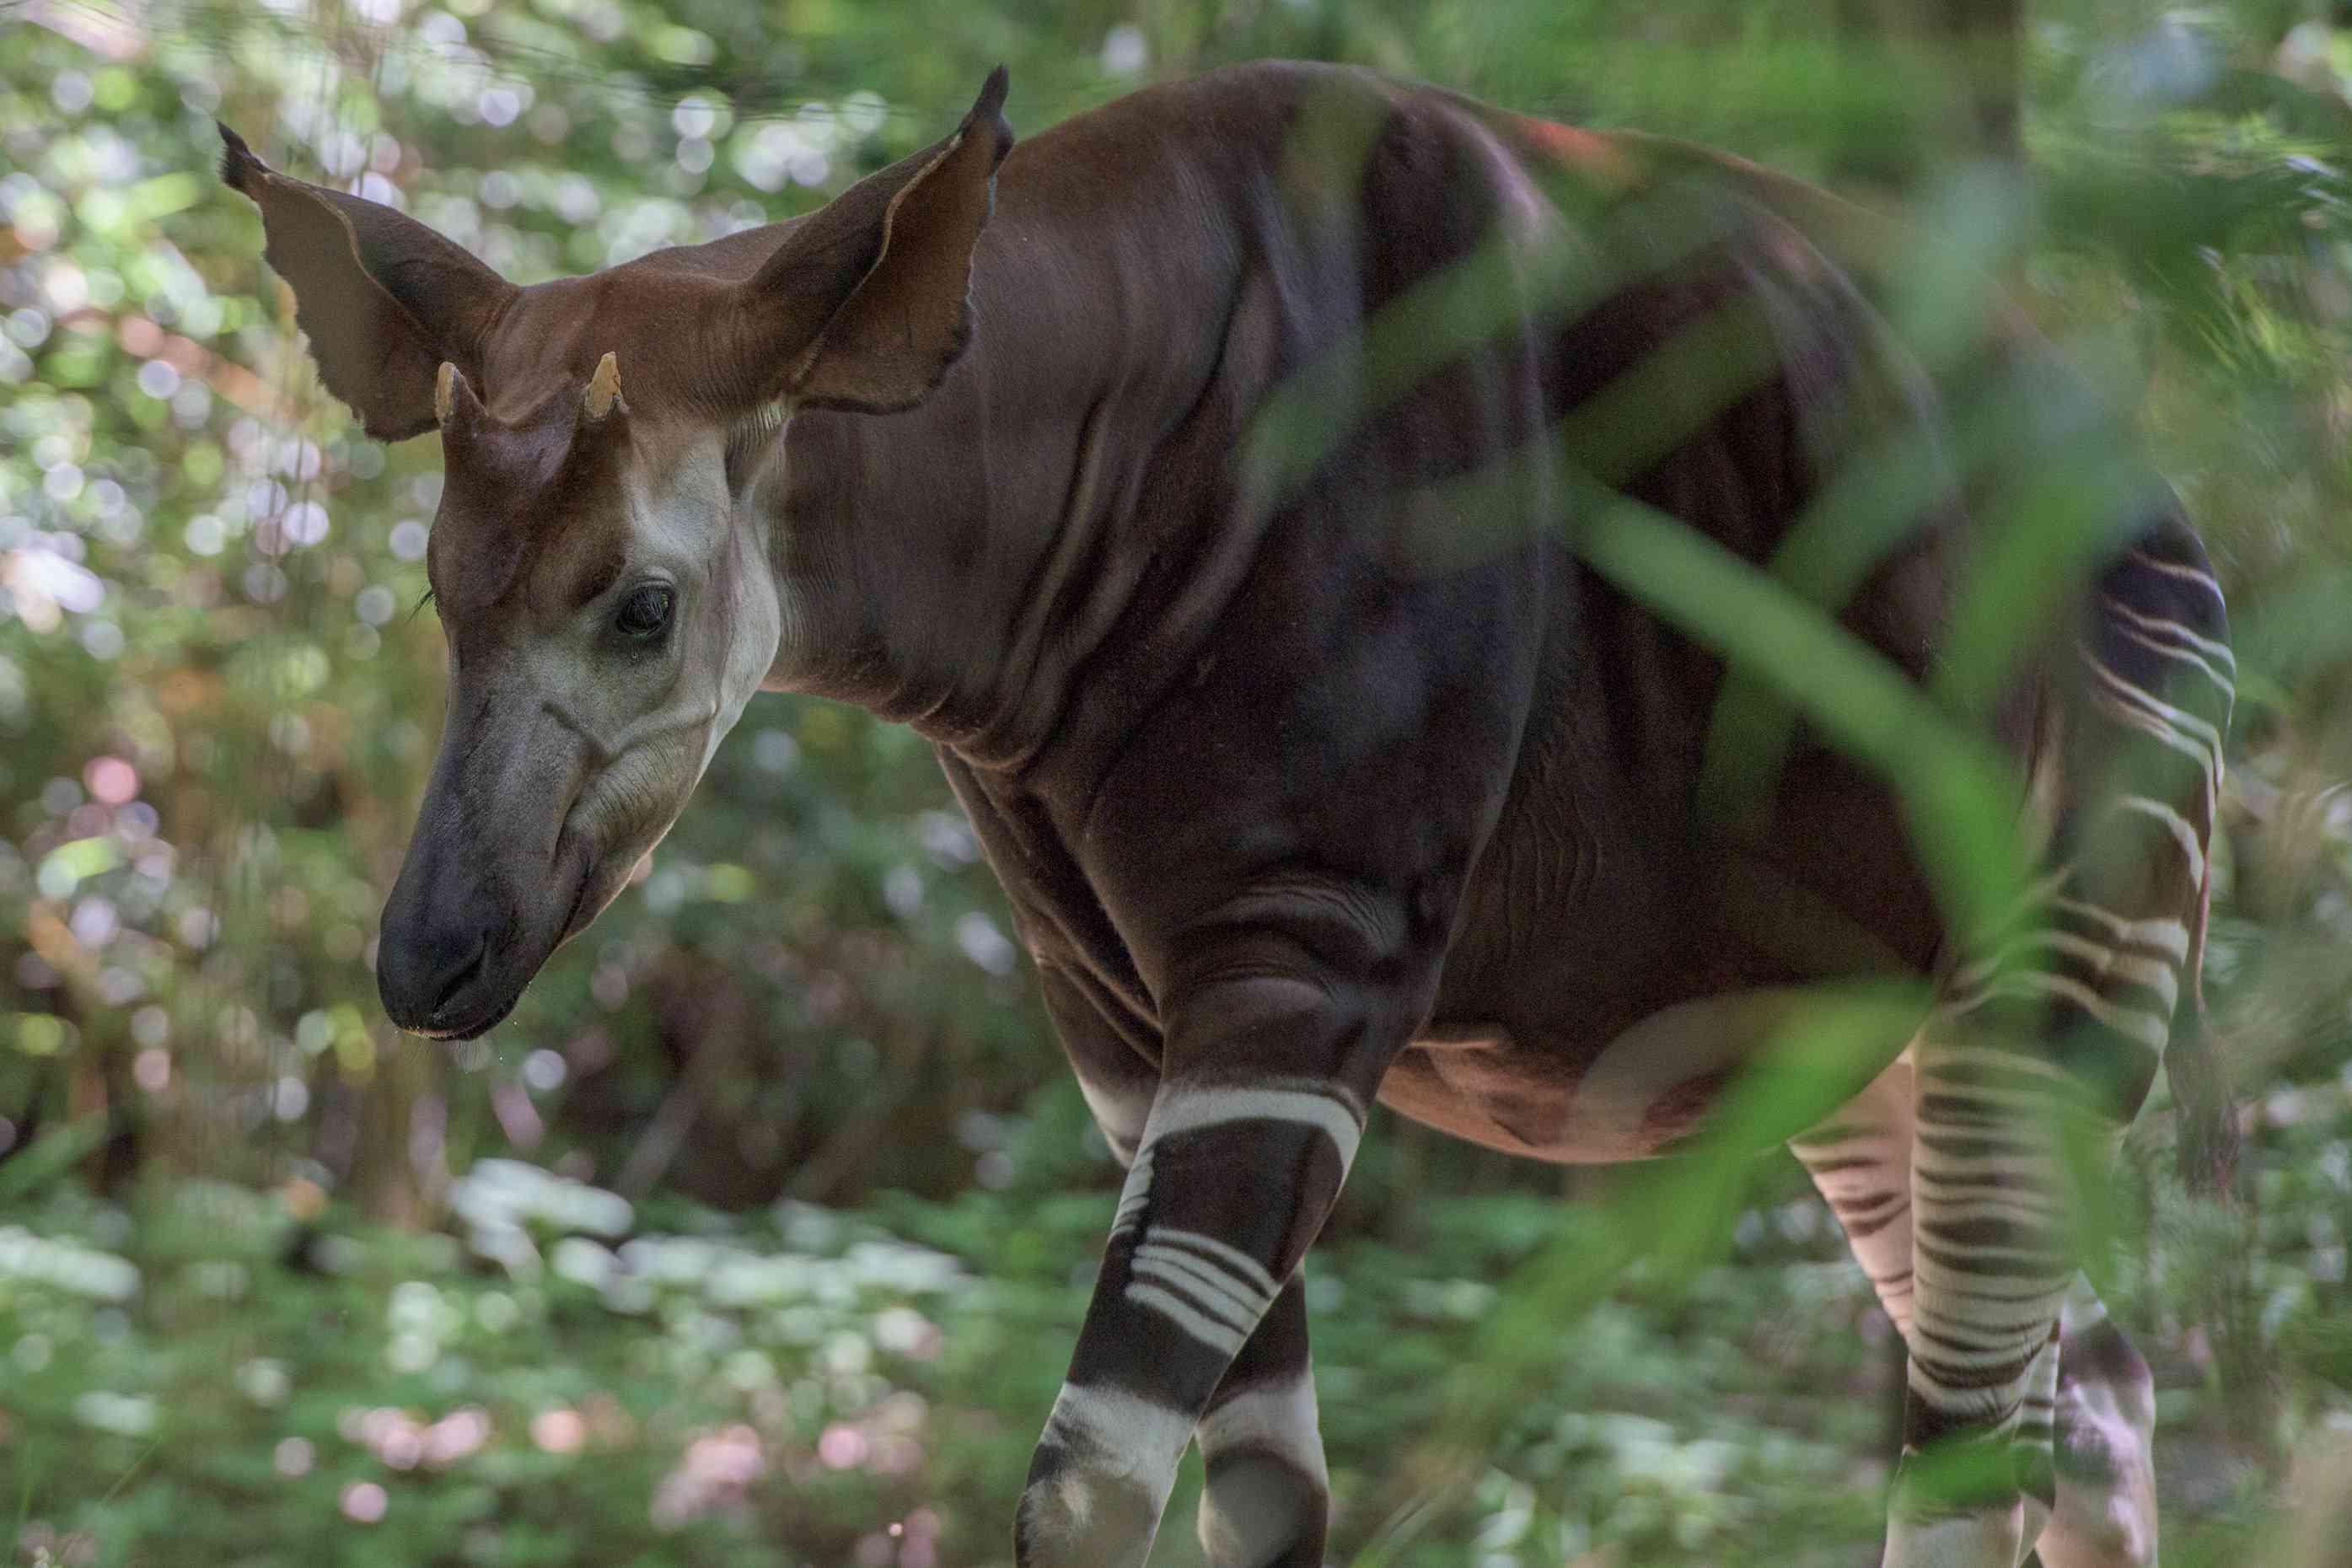 Okapi walking in the forest